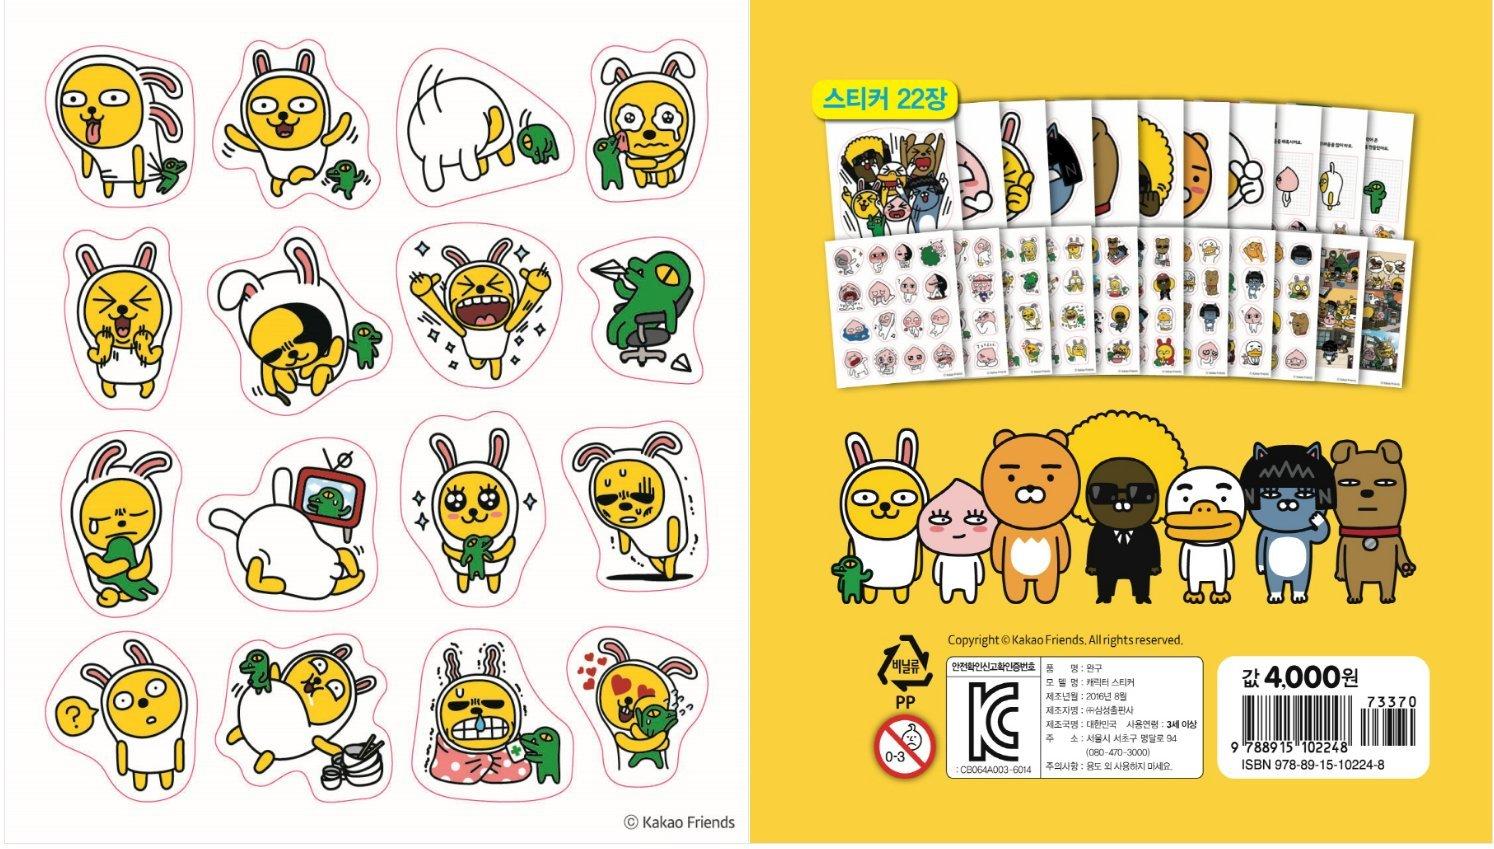 Kakao Friends Character Sticker Book Muzi Version Play Fun Memo